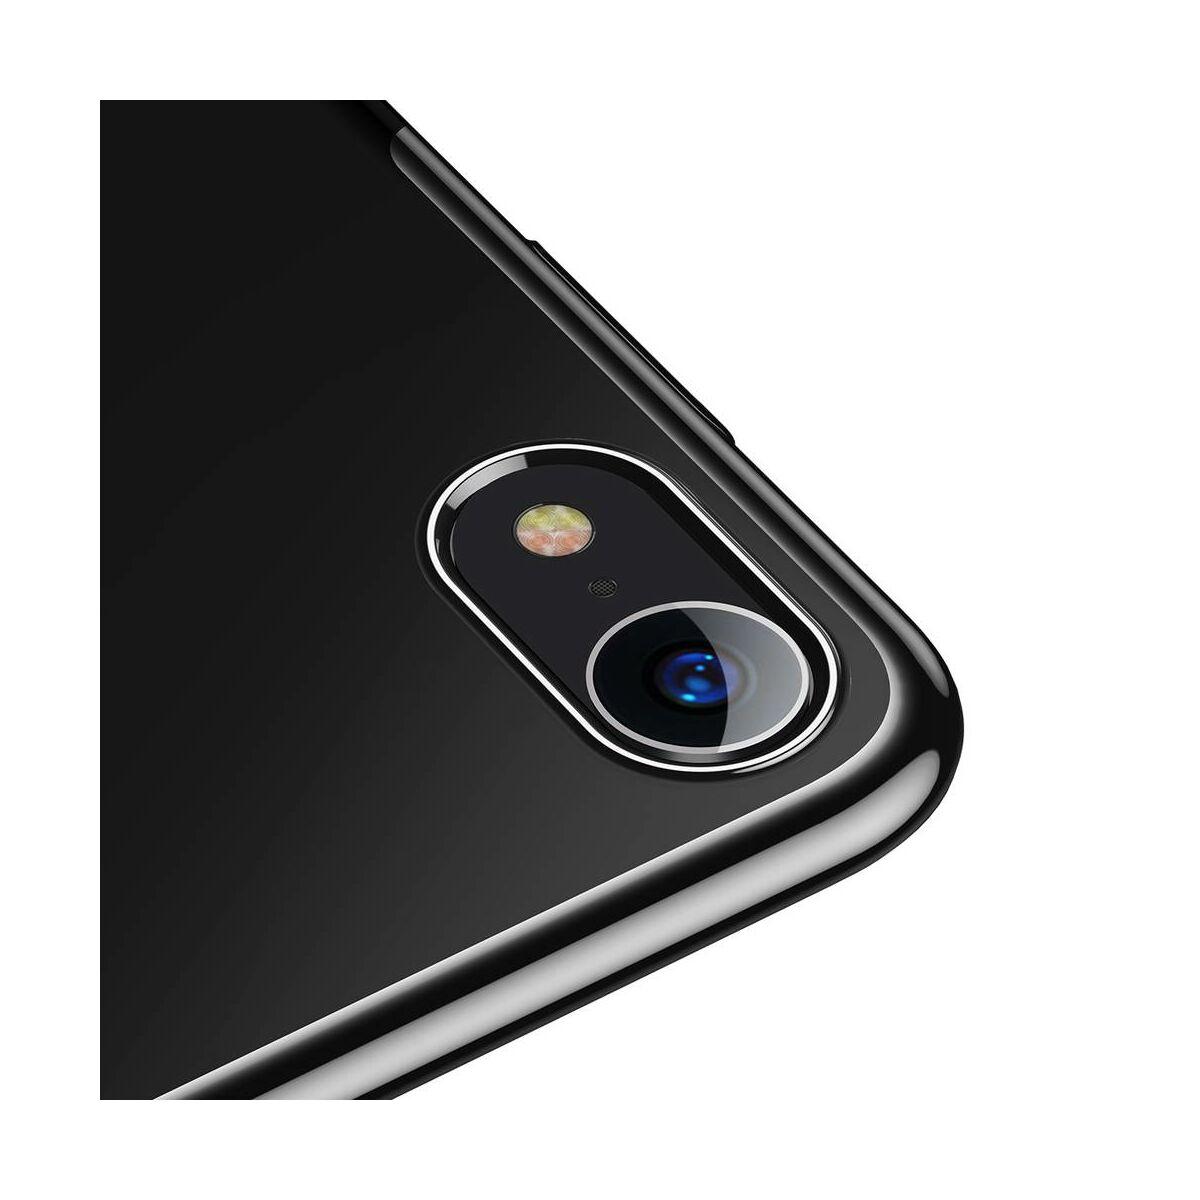 Baseus iPhone XR tok, Glitter, fekete (WIAPIPH61-DW01)